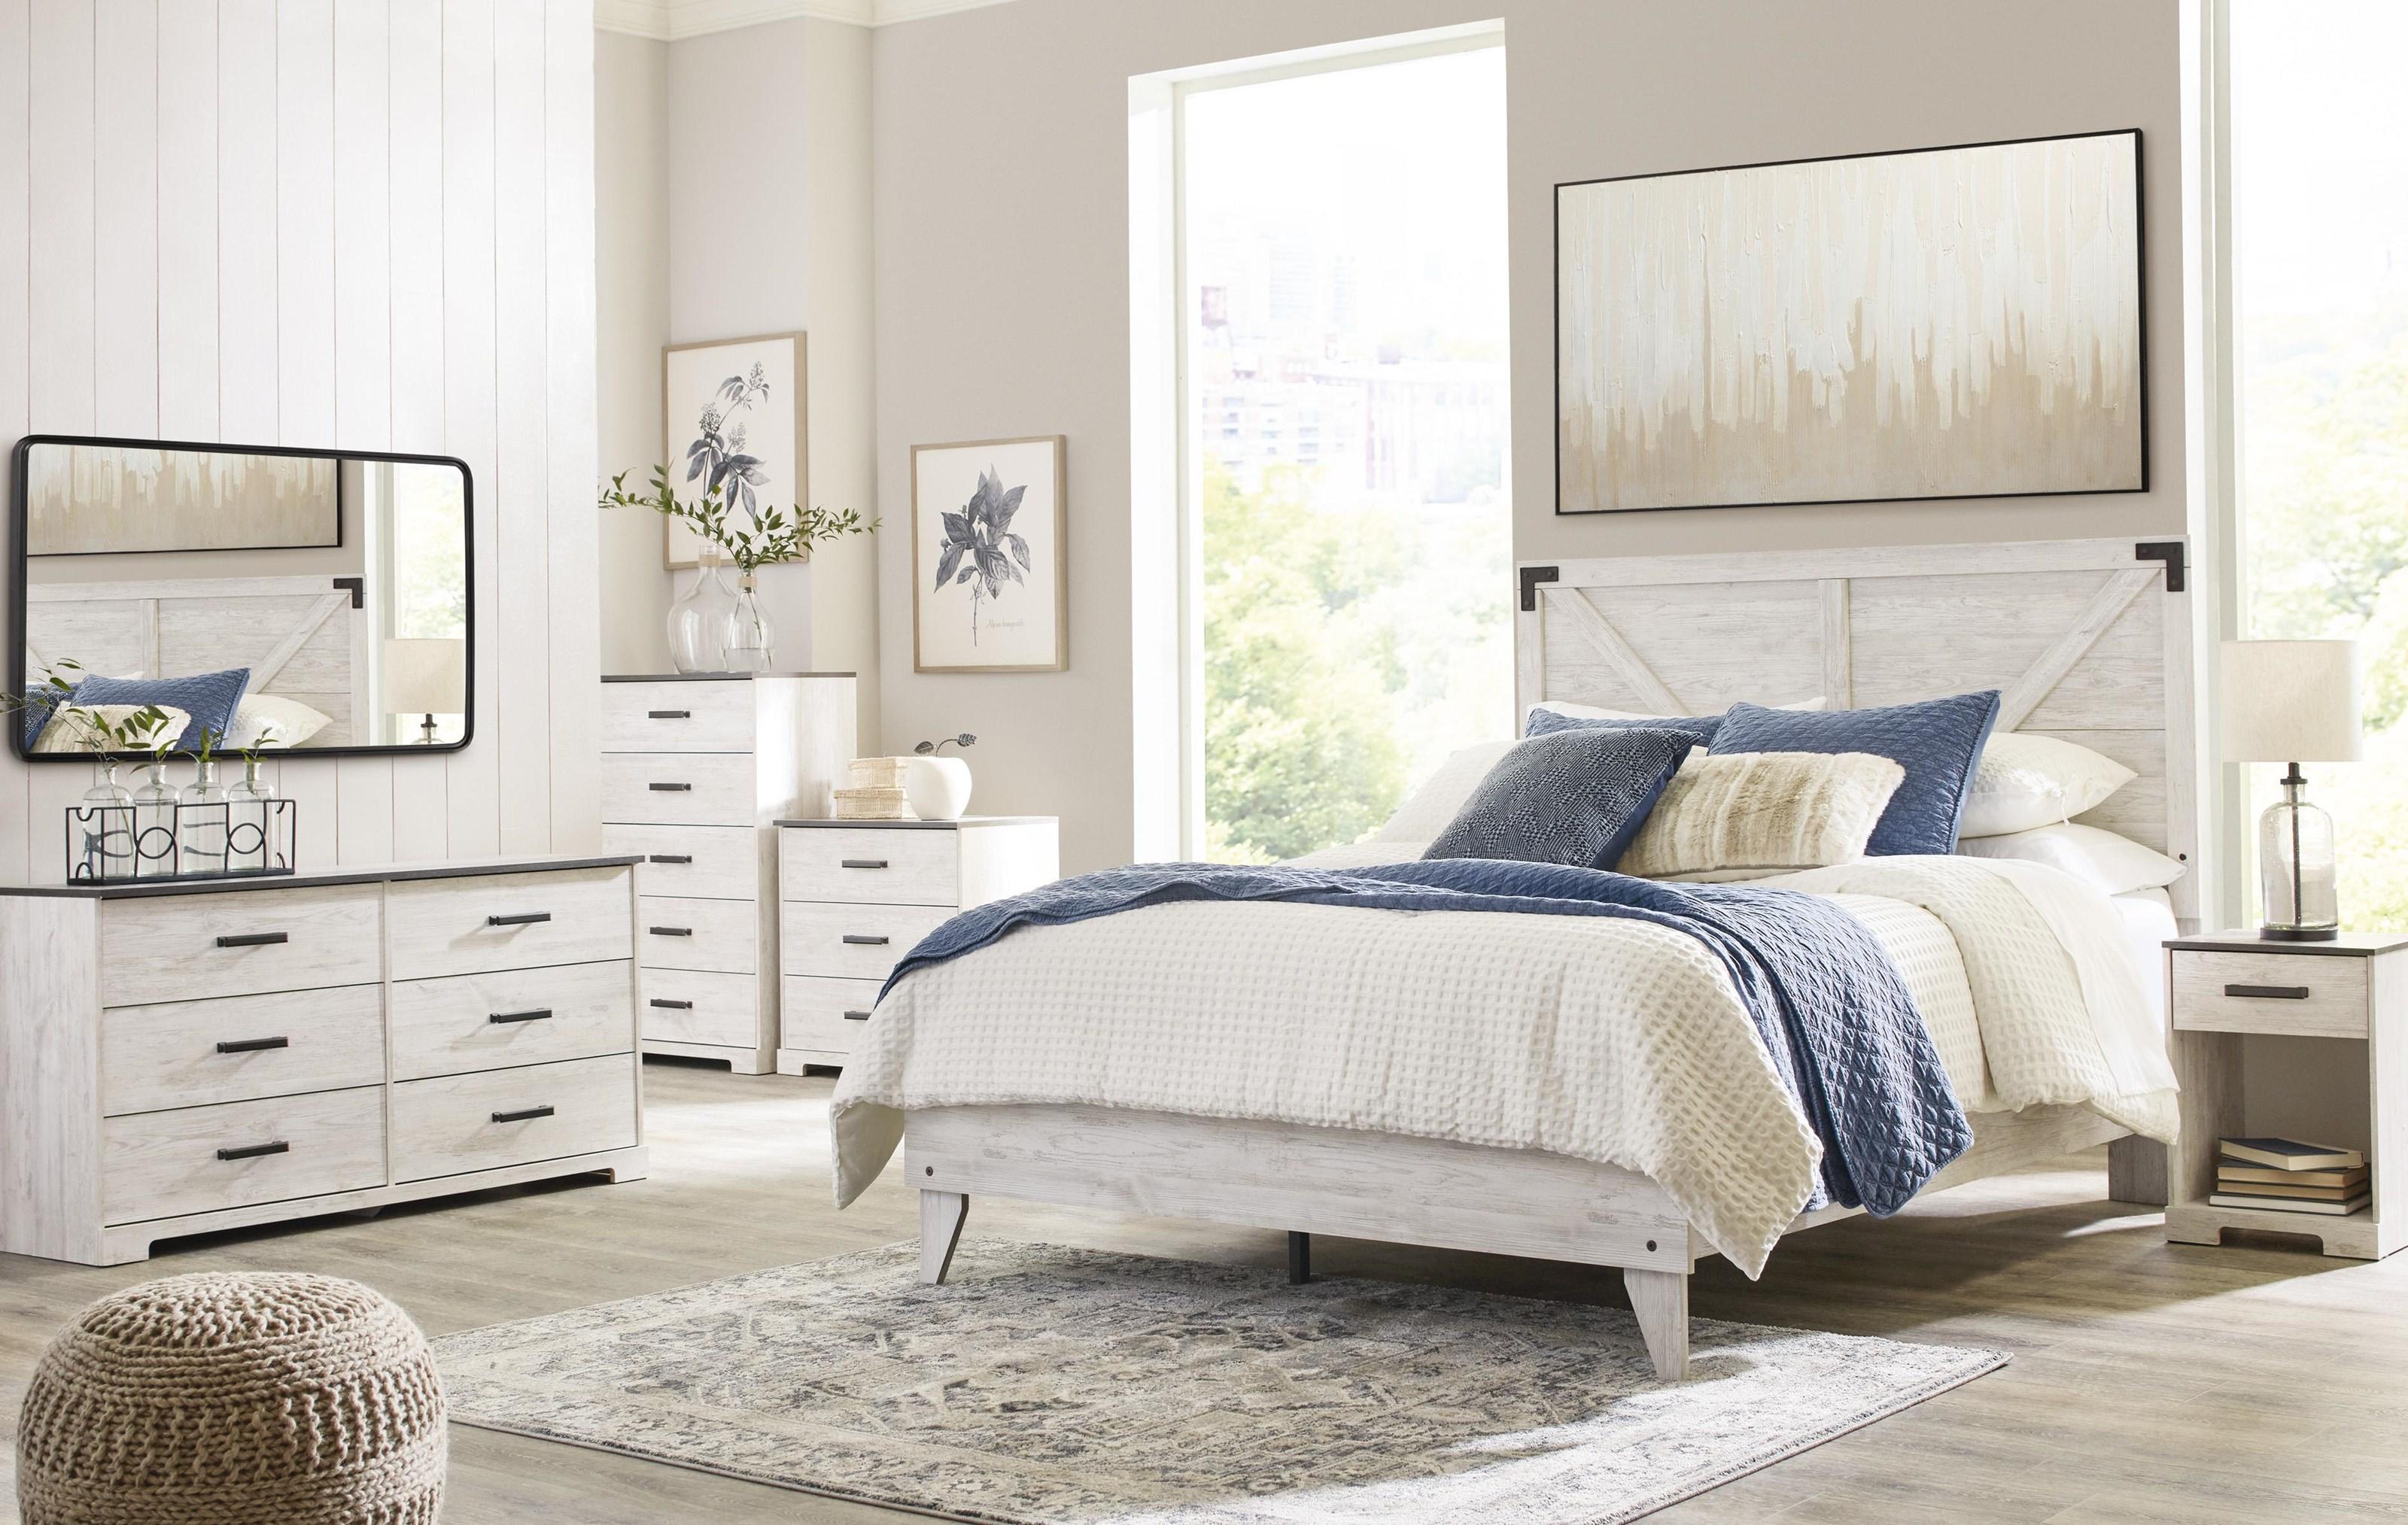 Shawburn 3 Piece Full Bedroom Set by Signature Design by Ashley at Sam Levitz Furniture